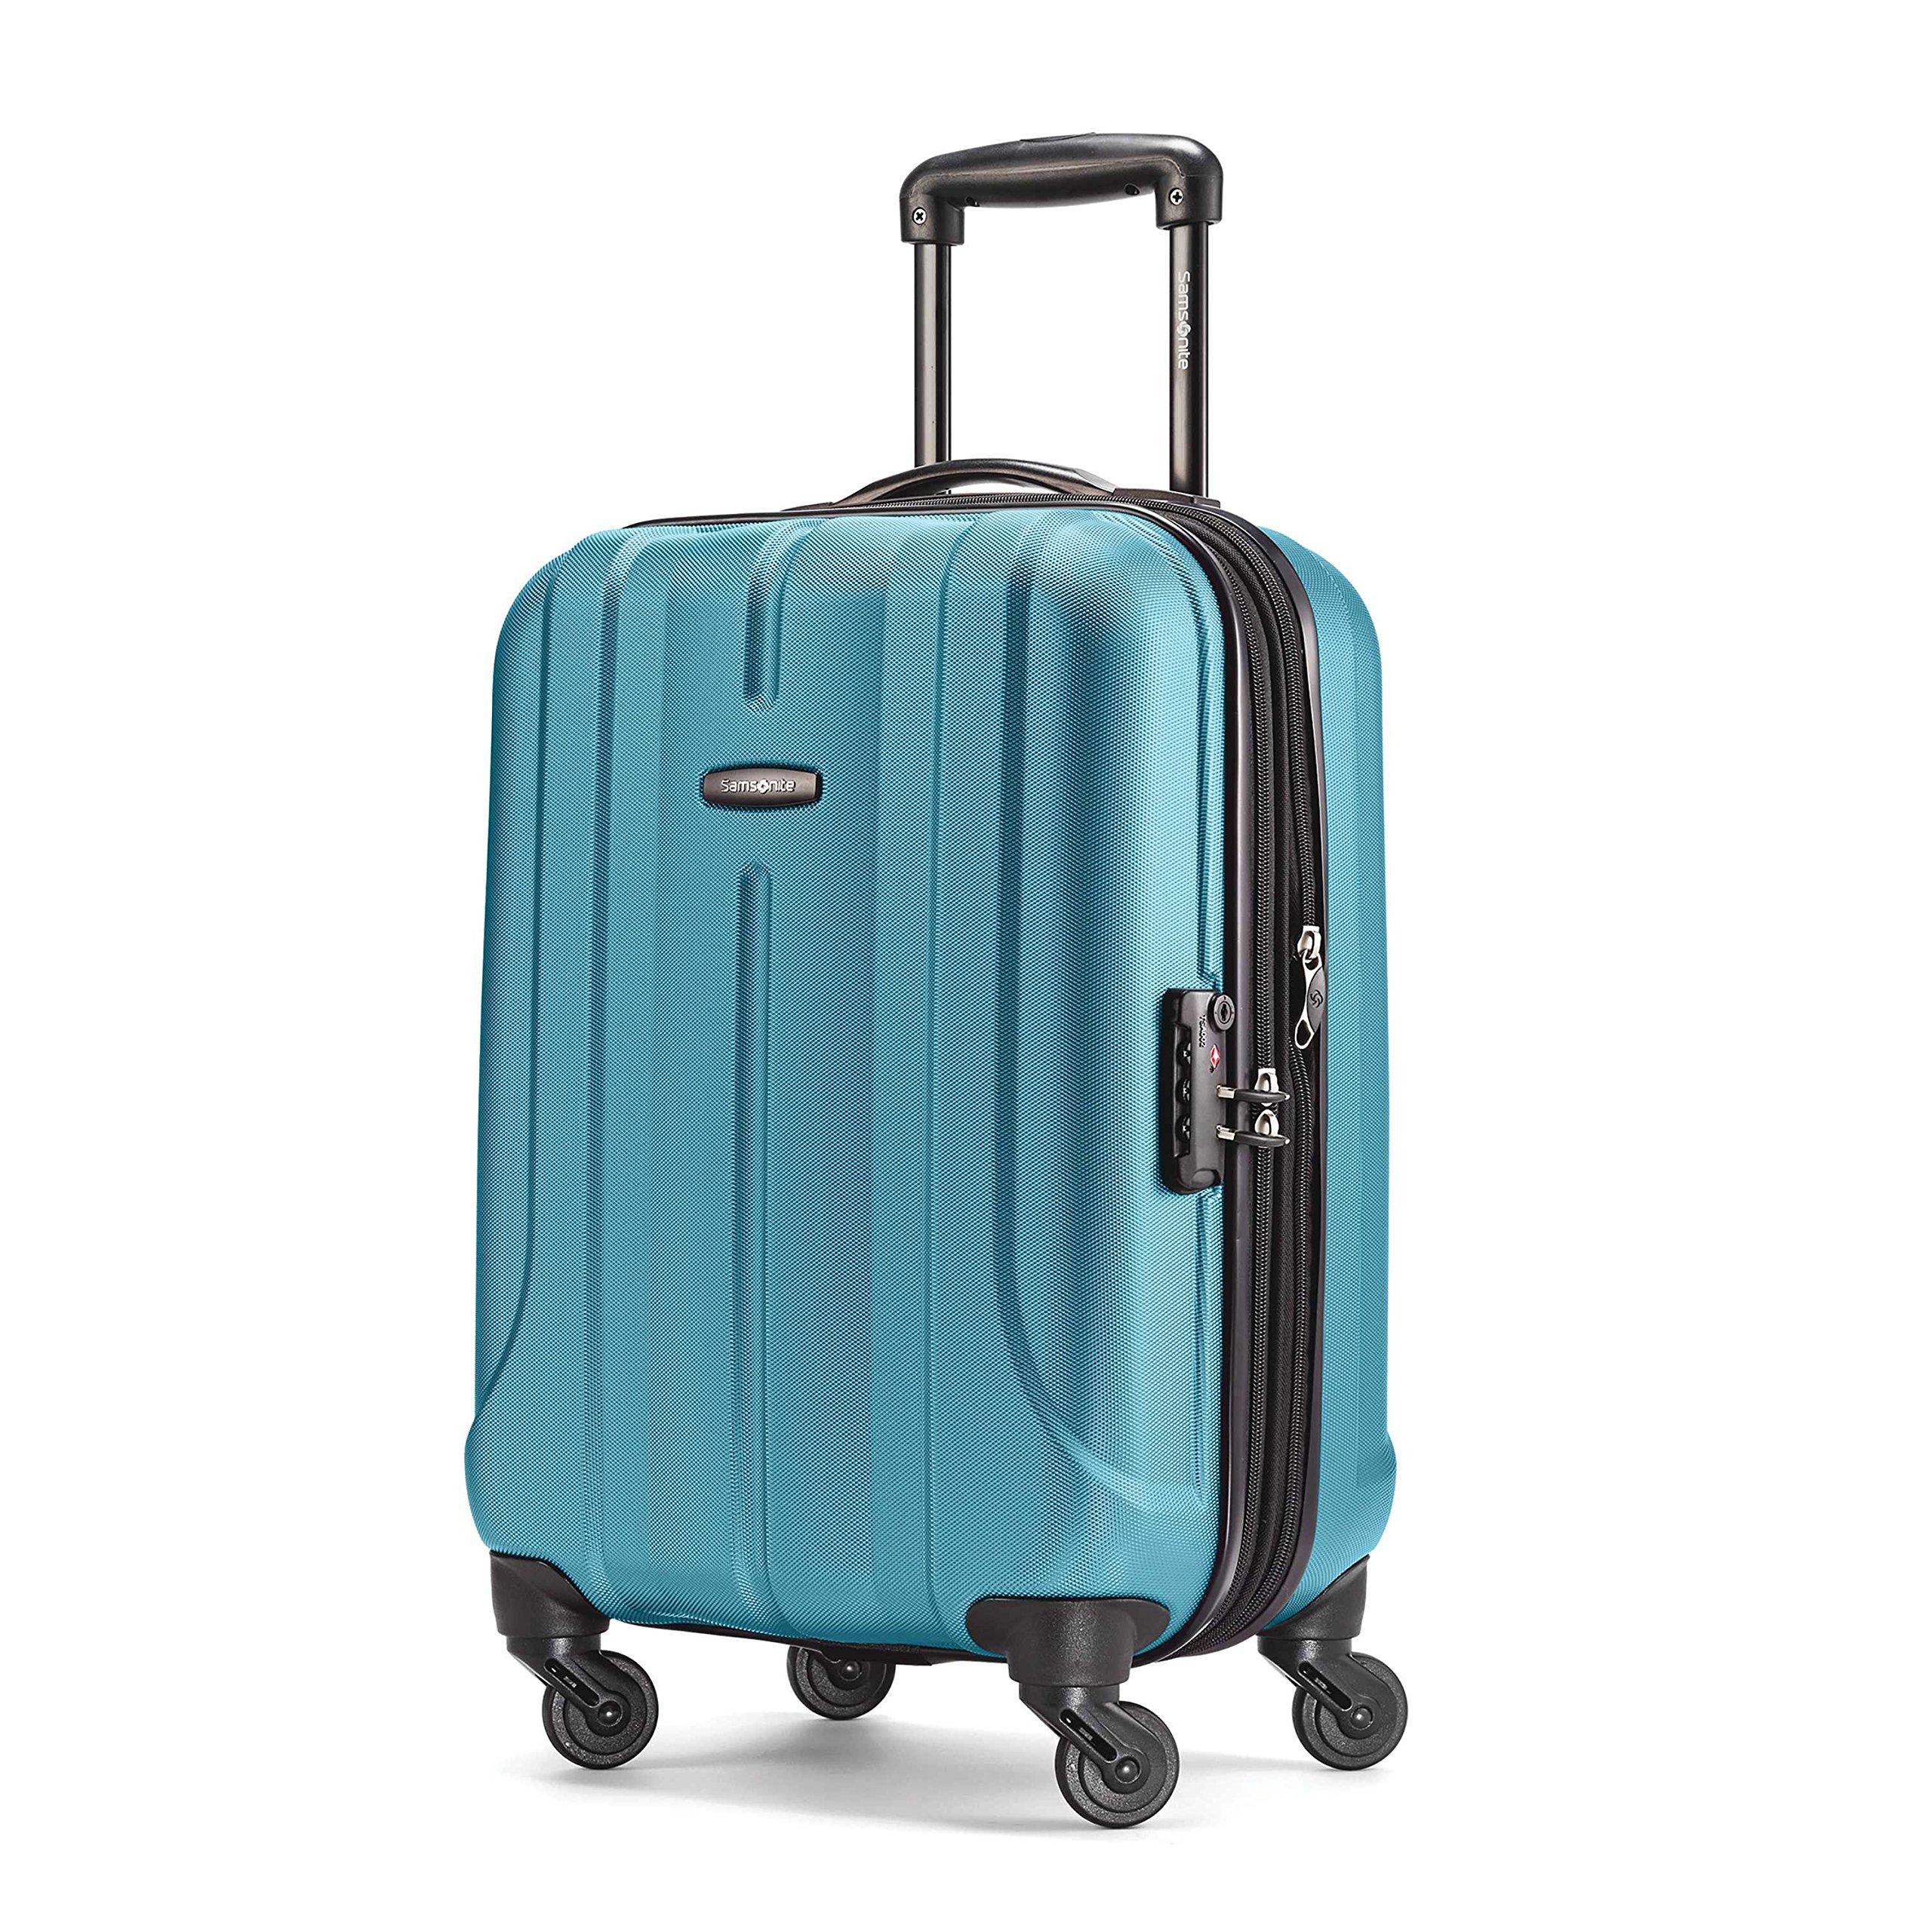 Samsonite Fiero 20 Quot Spinner Ocean Blue Ebay